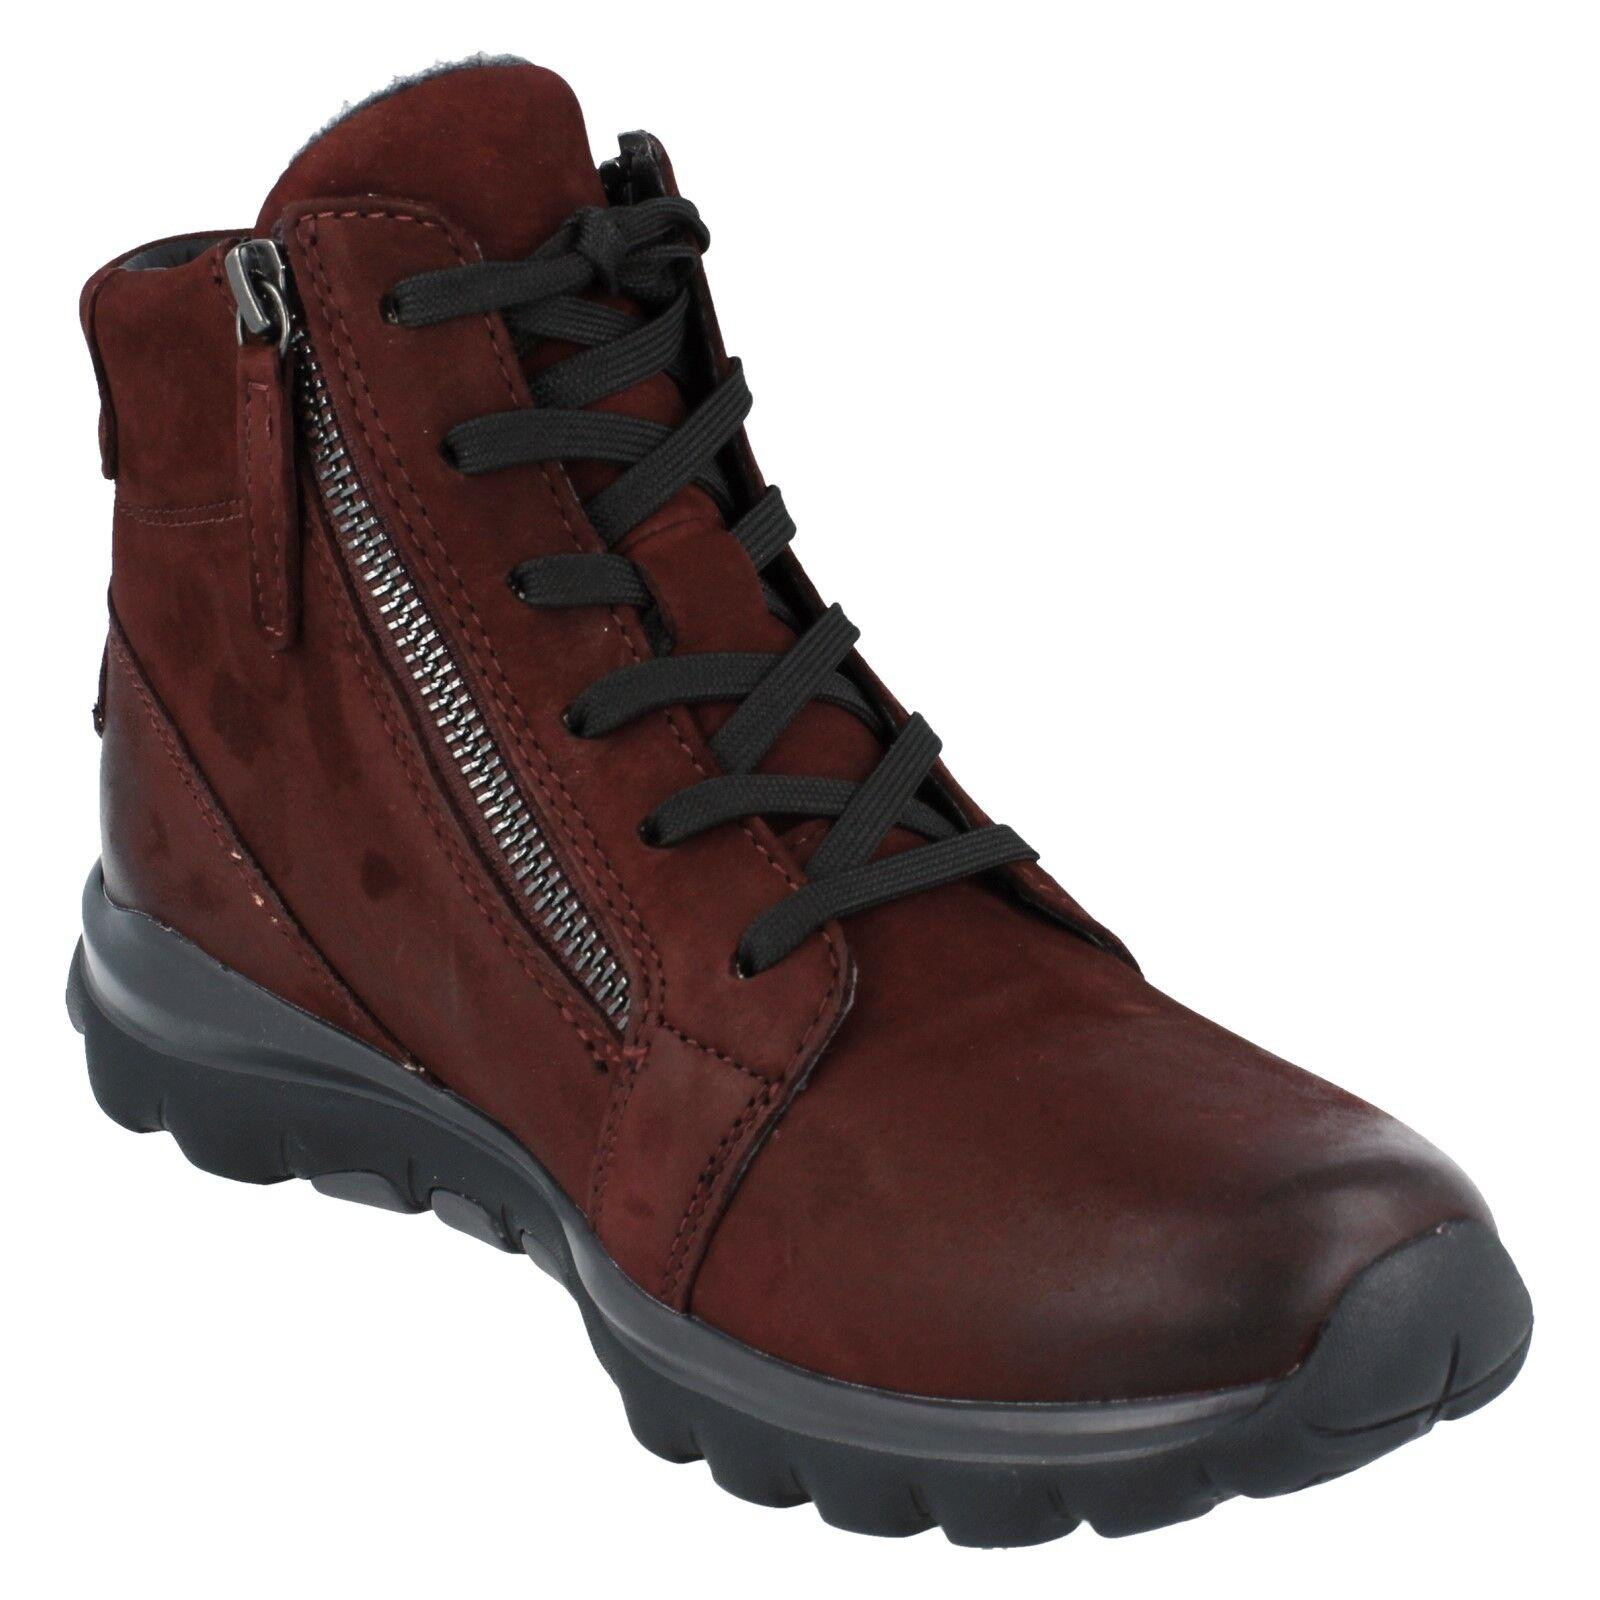 Ladies Gabor Rolling Soft Soft Soft Walking Boots - 96958 edbaad